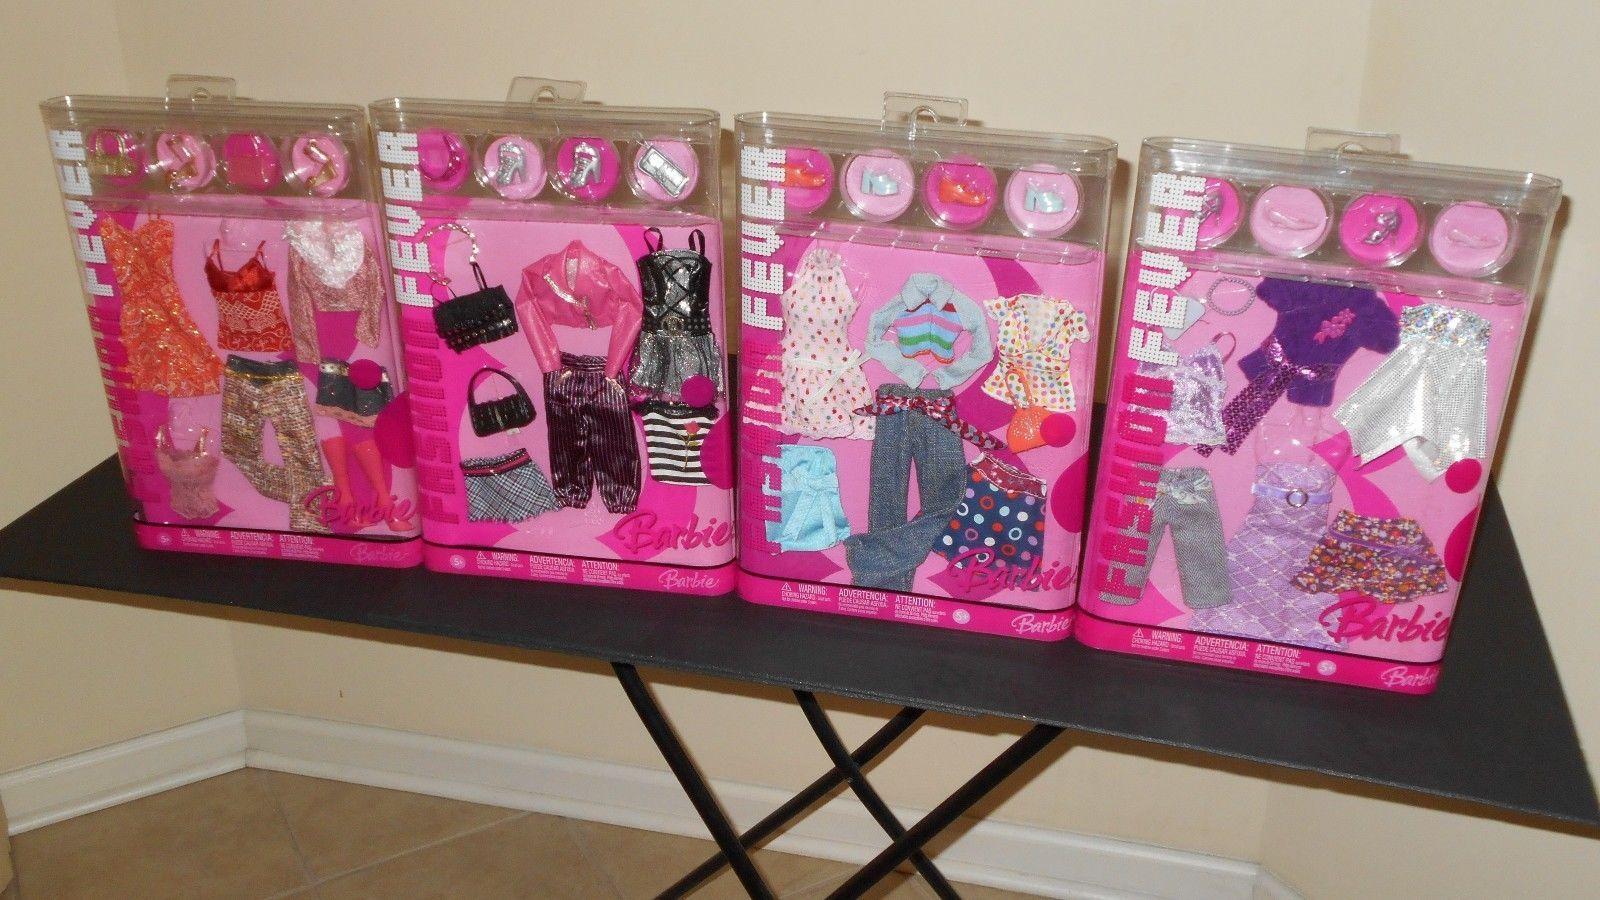 Details Over 4 Fashion Fever Barbie Doll Fashion Clothes Closets 2006 New Barbie Doll Accessories Vintage Barbie Clothes Barbie Dolls